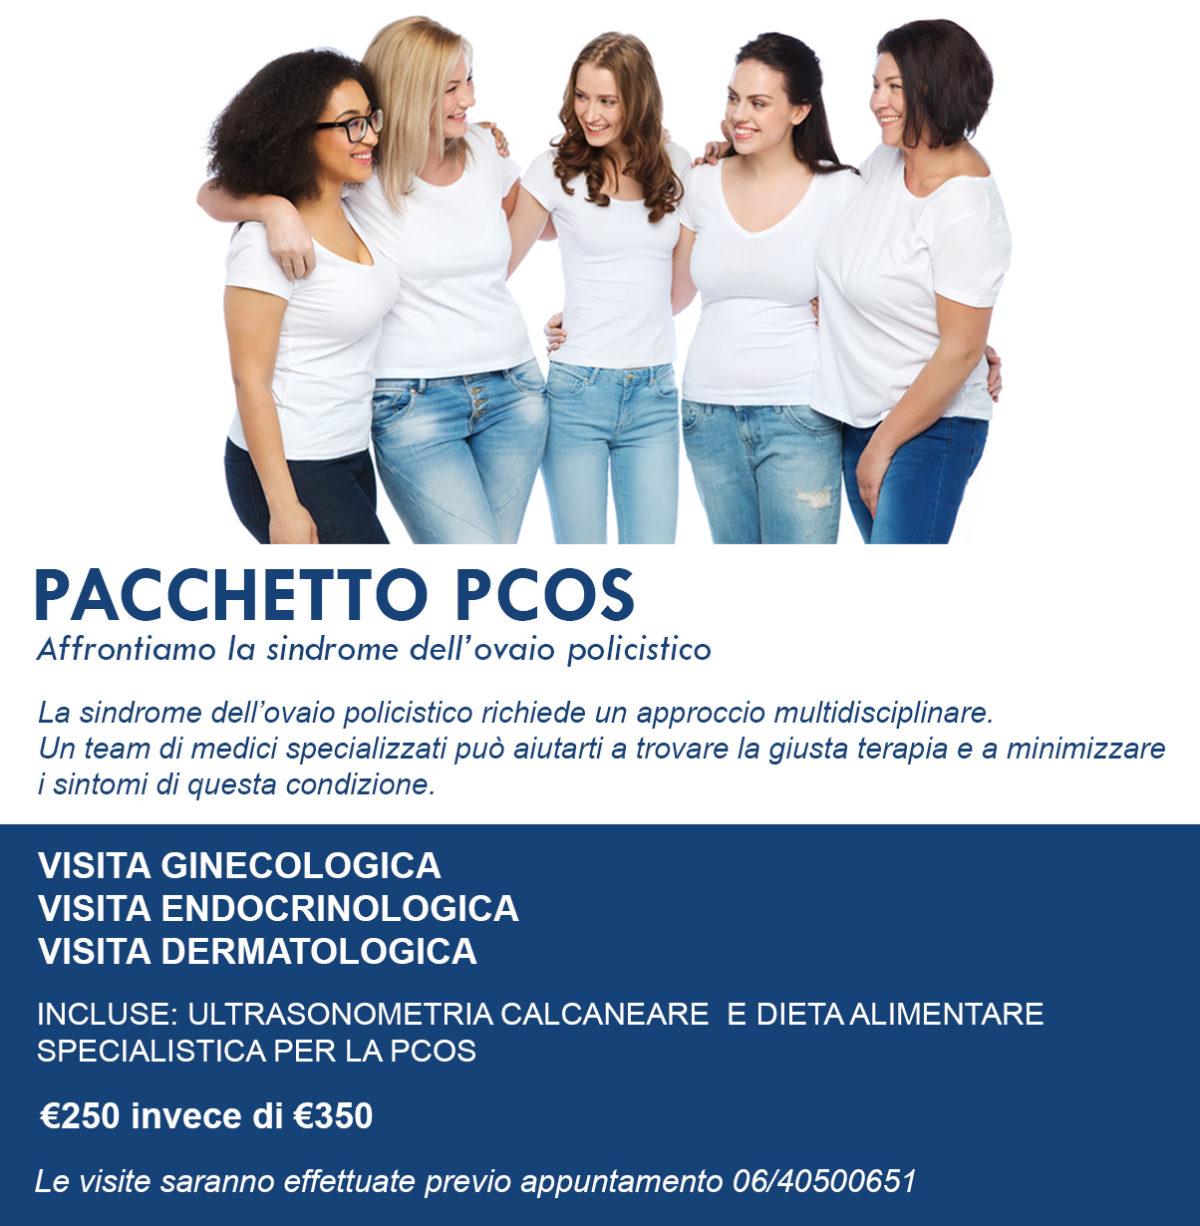 pcos-agunco-1-1200x1226.jpg